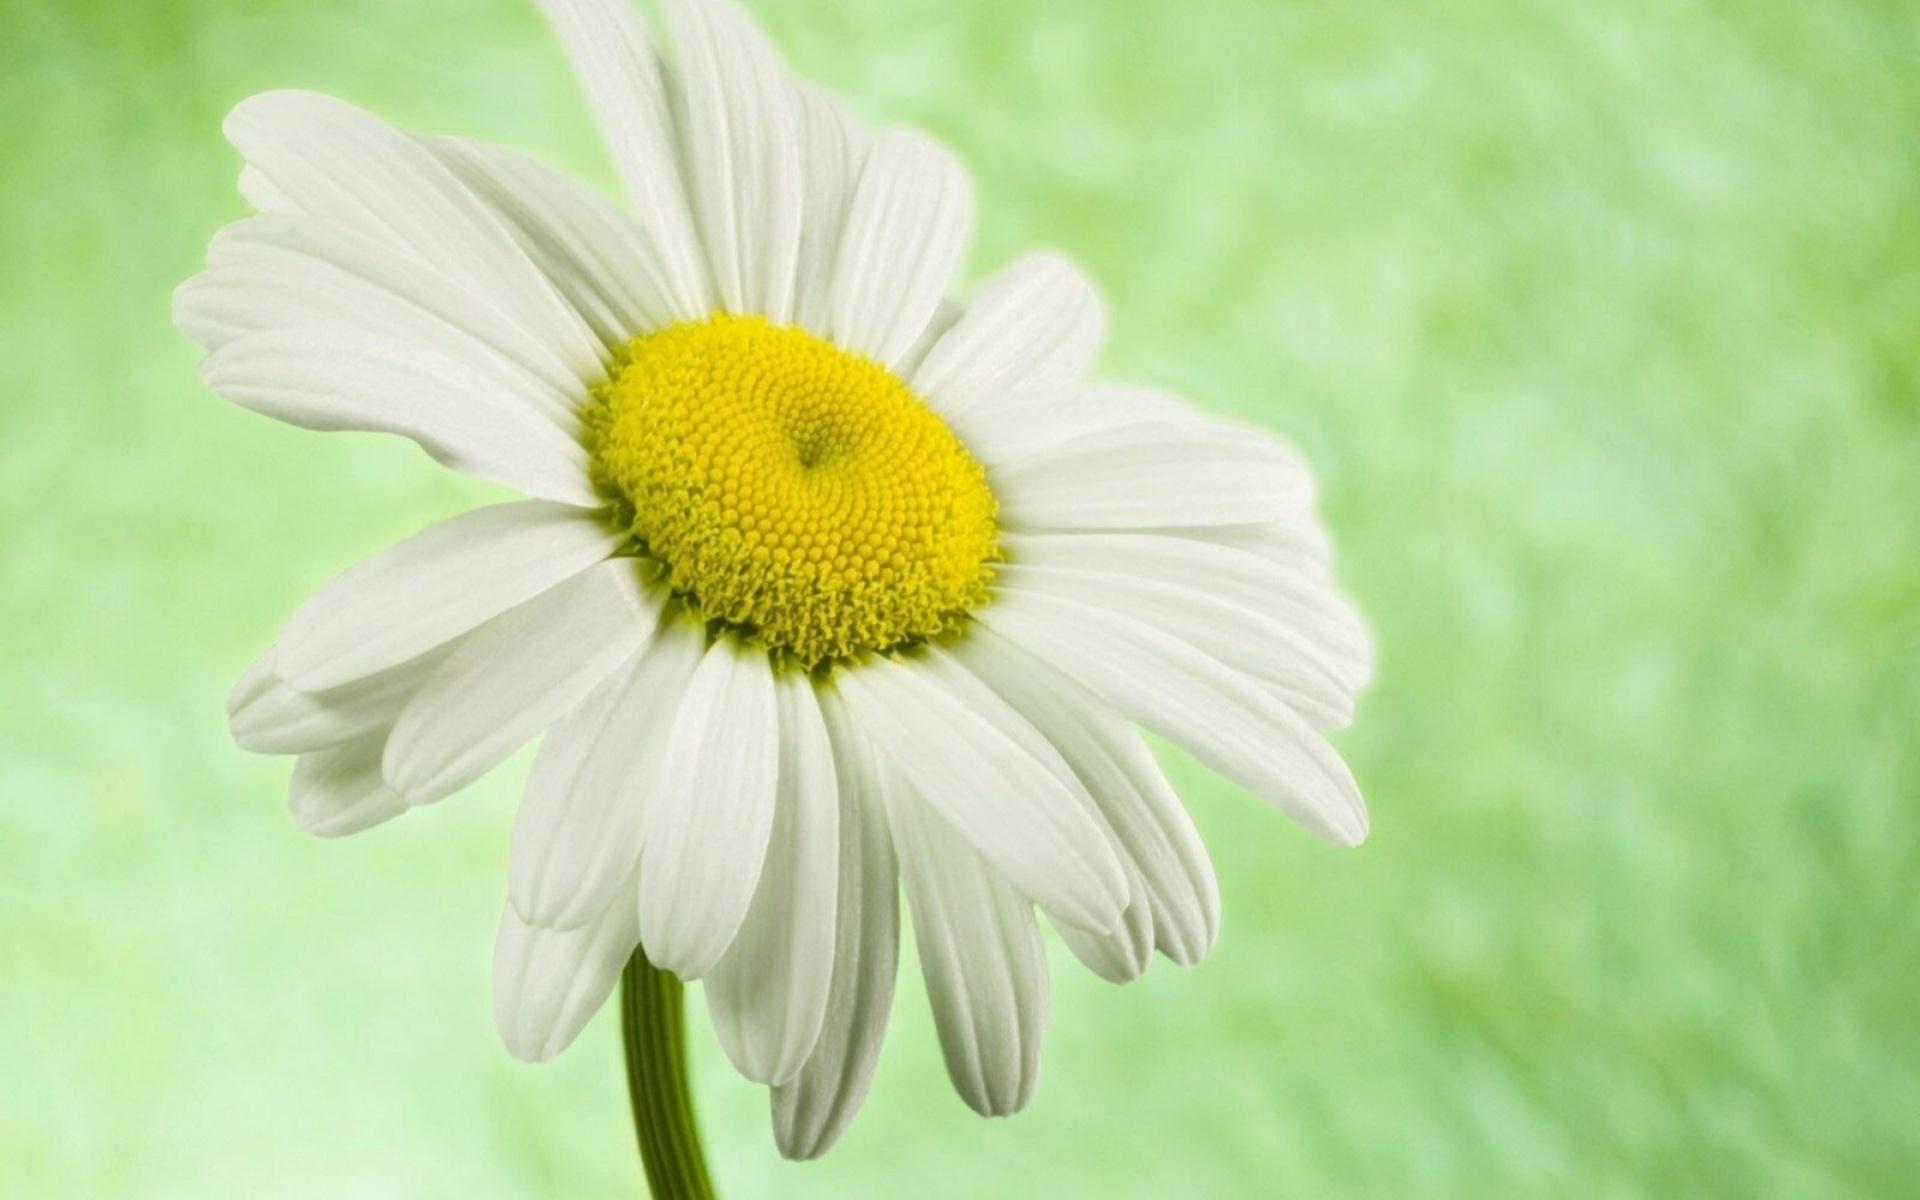 hinh anh hoa cuc dep 17